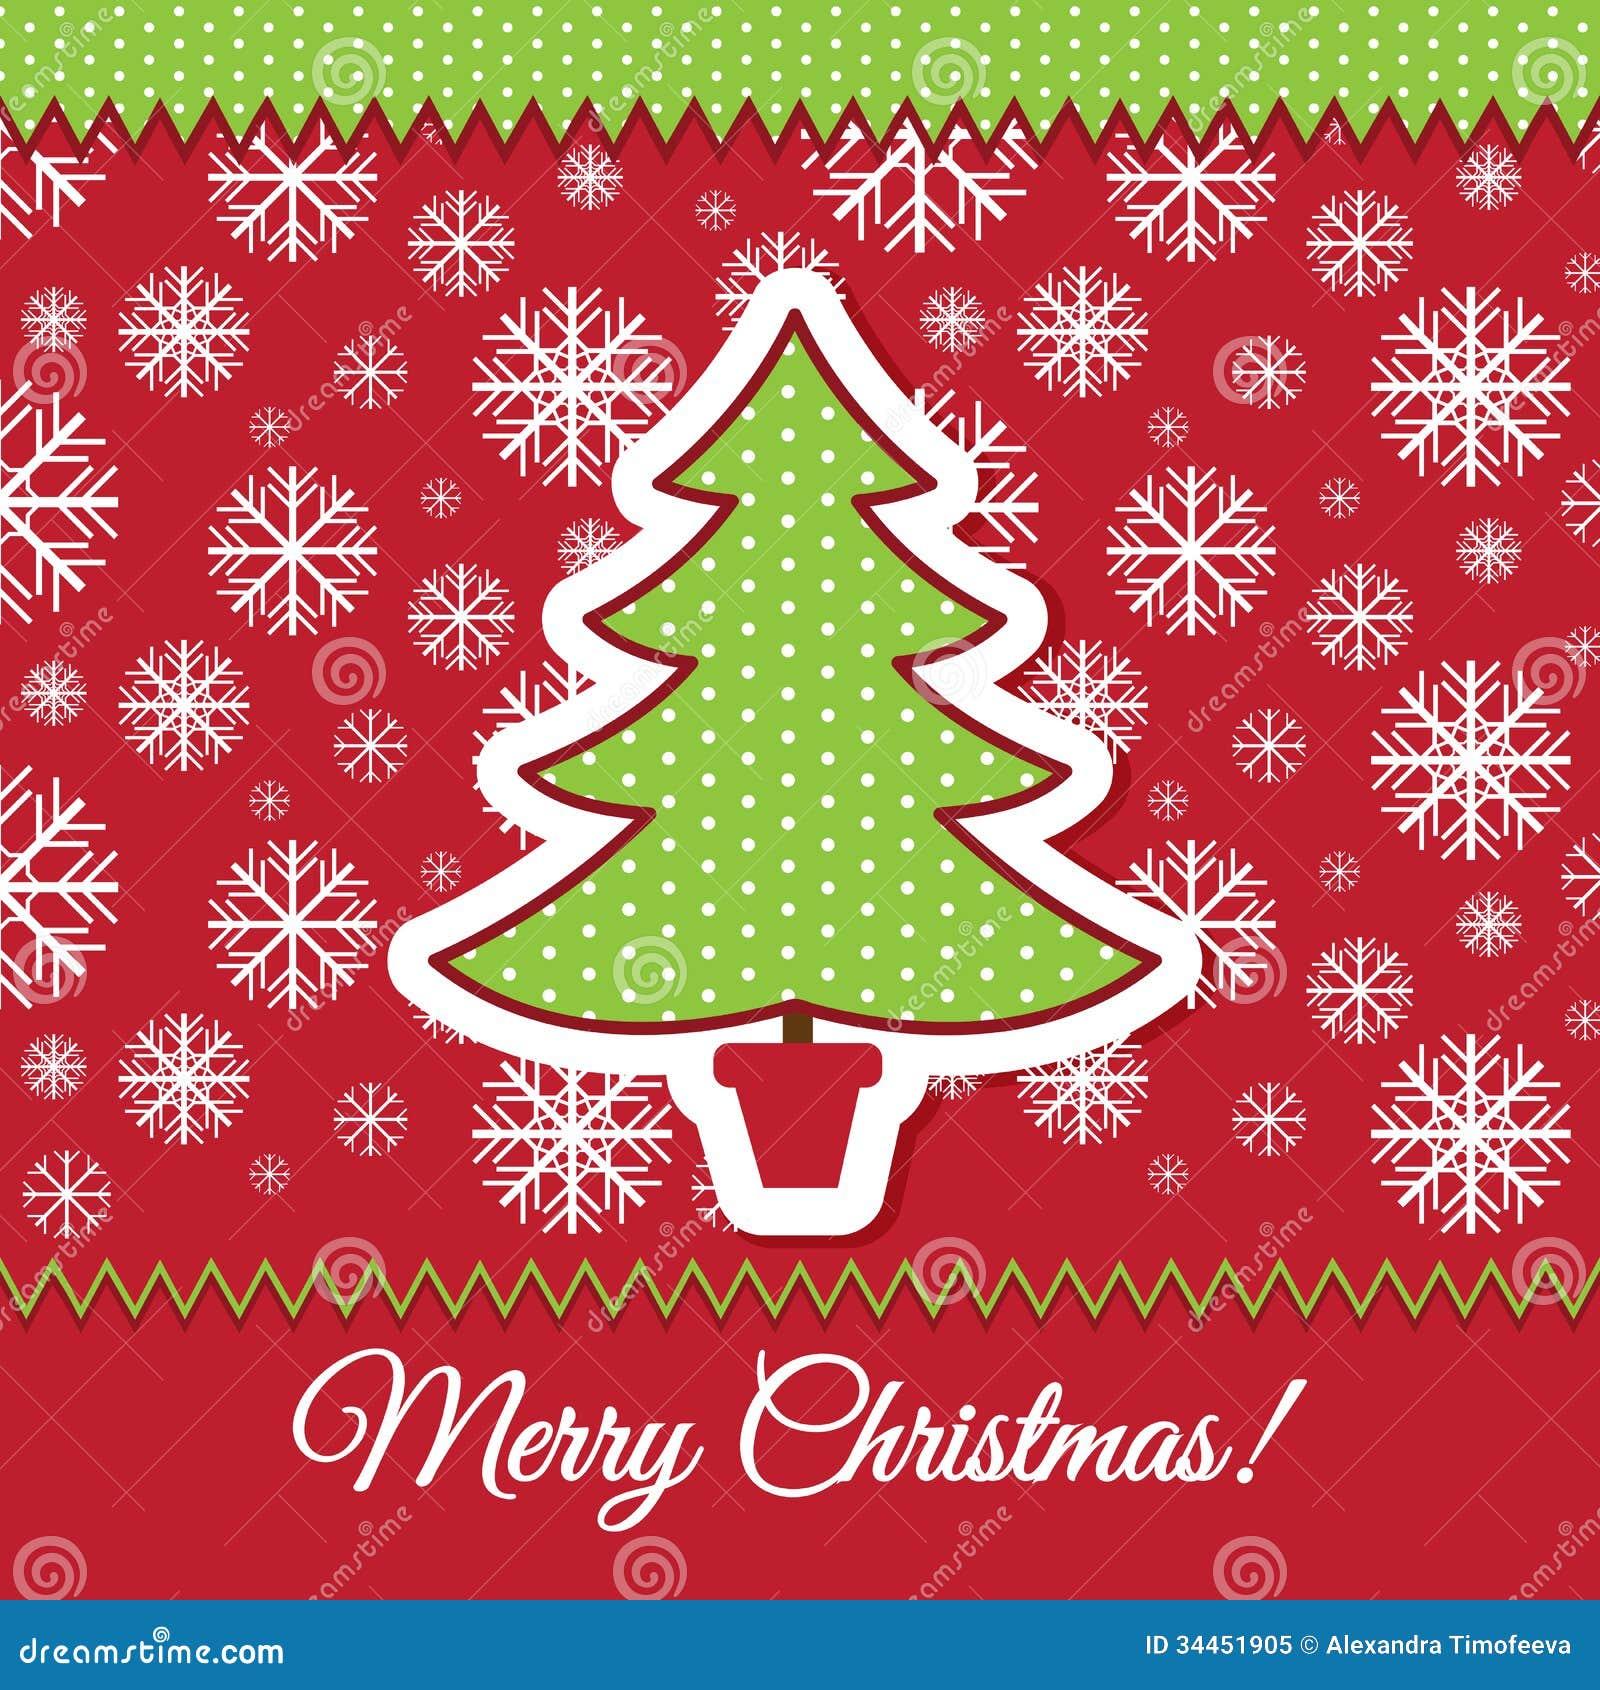 Dise o de la tarjeta de felicitaci n del rbol de navidad - Arbol navidad diseno ...